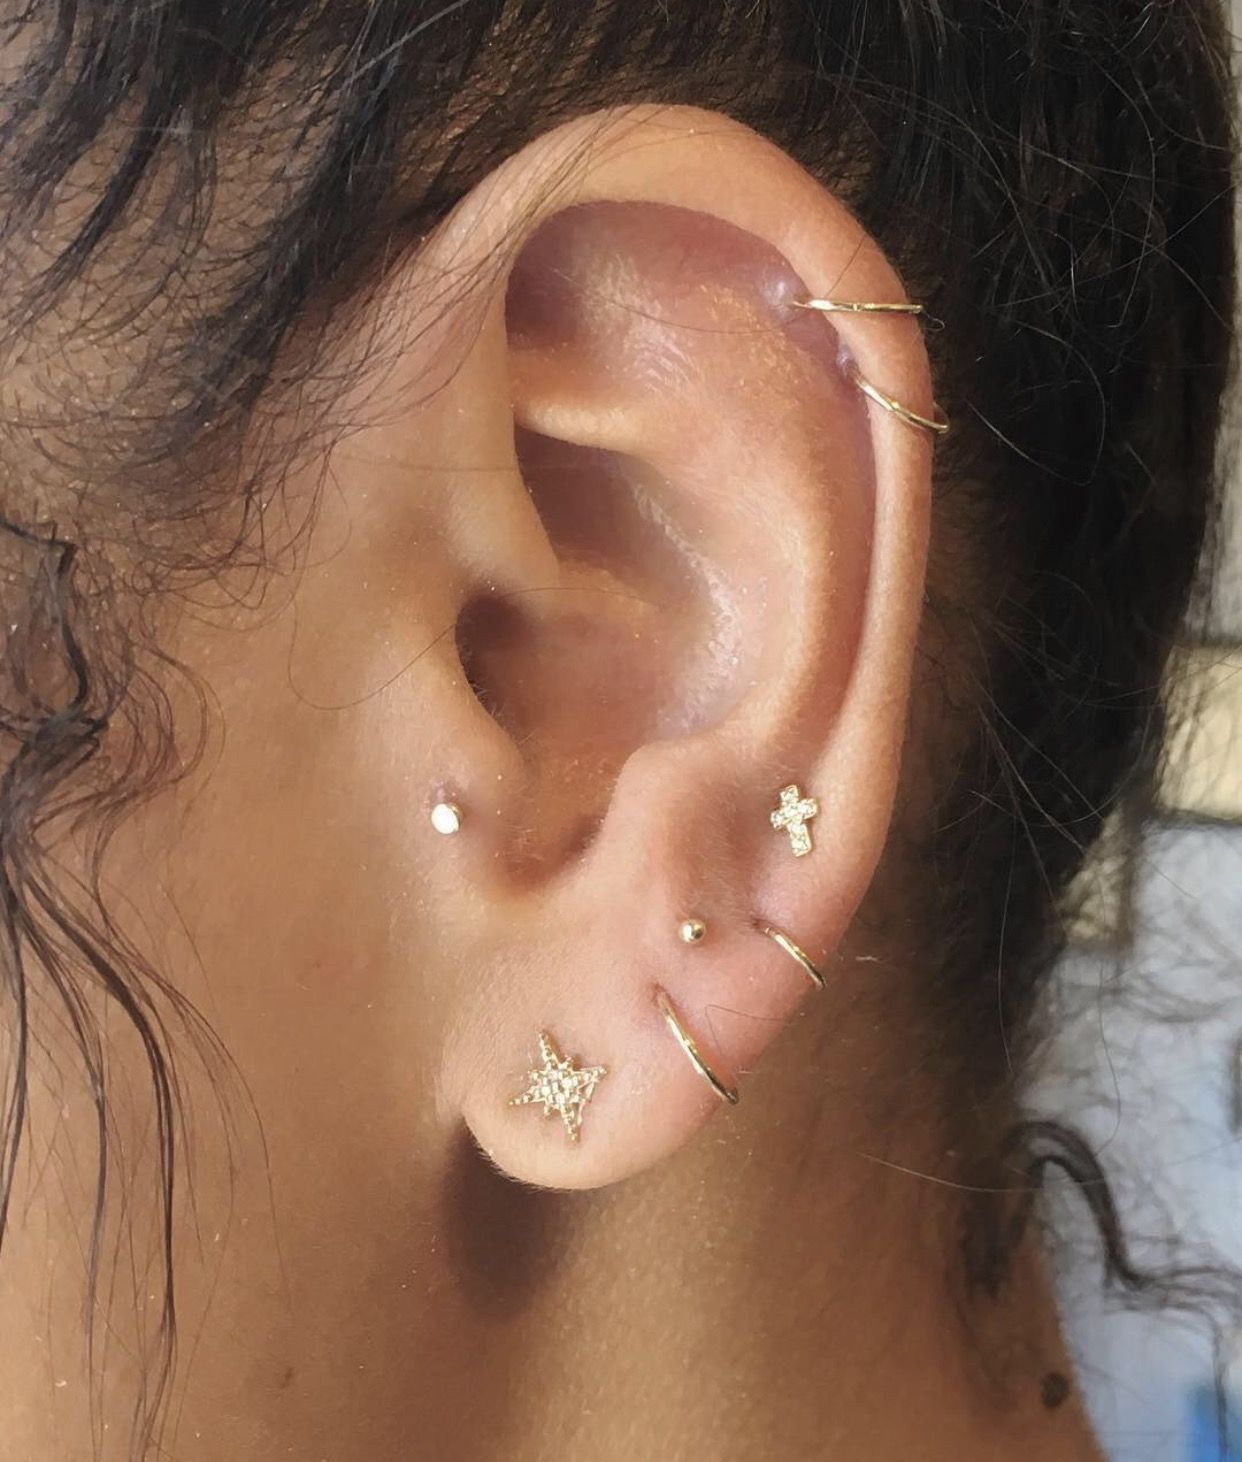 Nose piercing close up  vespernyc  beauty u bling  Pinterest  Piercings Piercing and